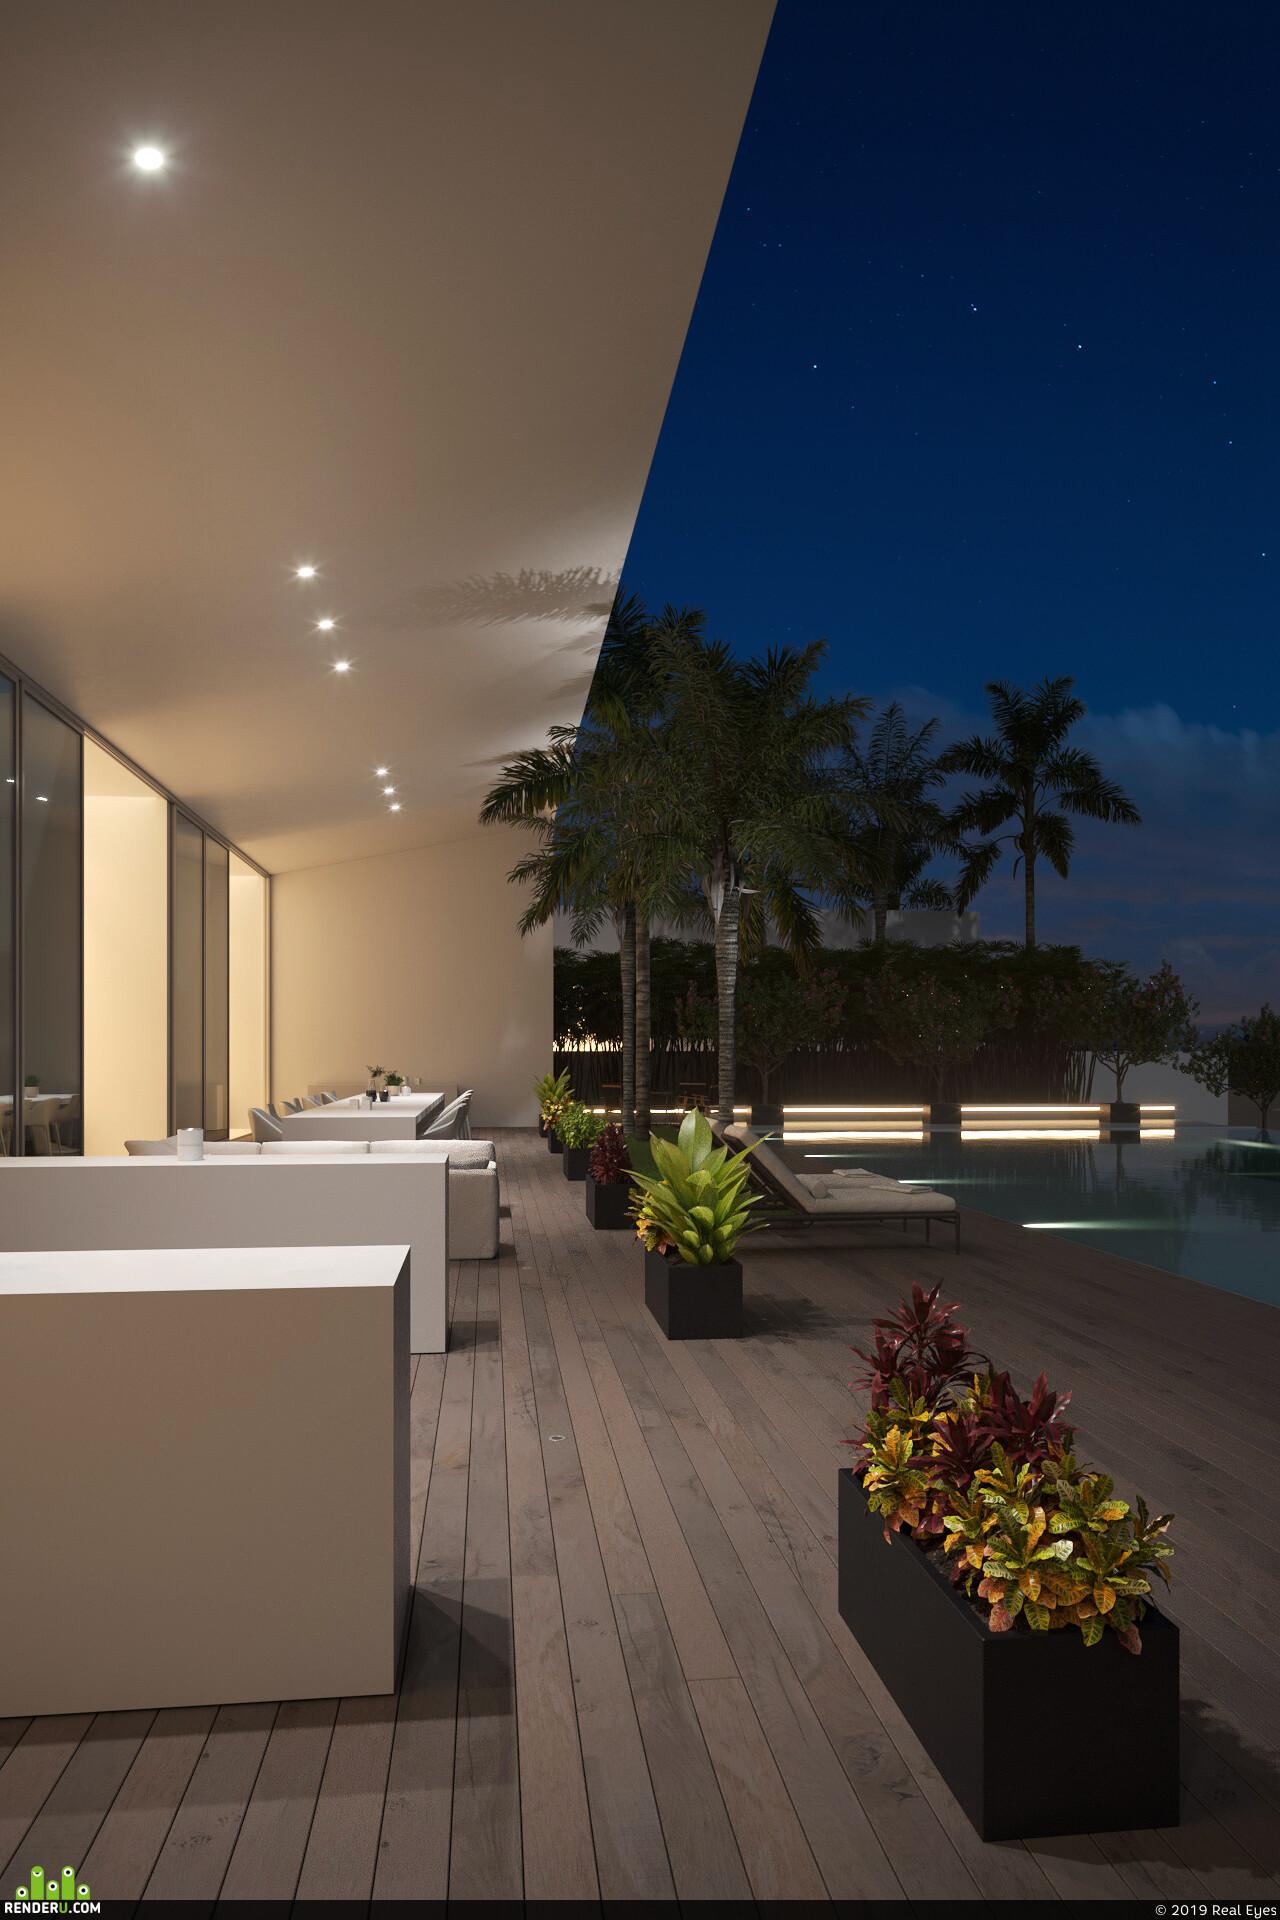 villa, coronarender, adobephotoshop, visualization, archviz, render, 3Dsmax, 3drendering, closeup